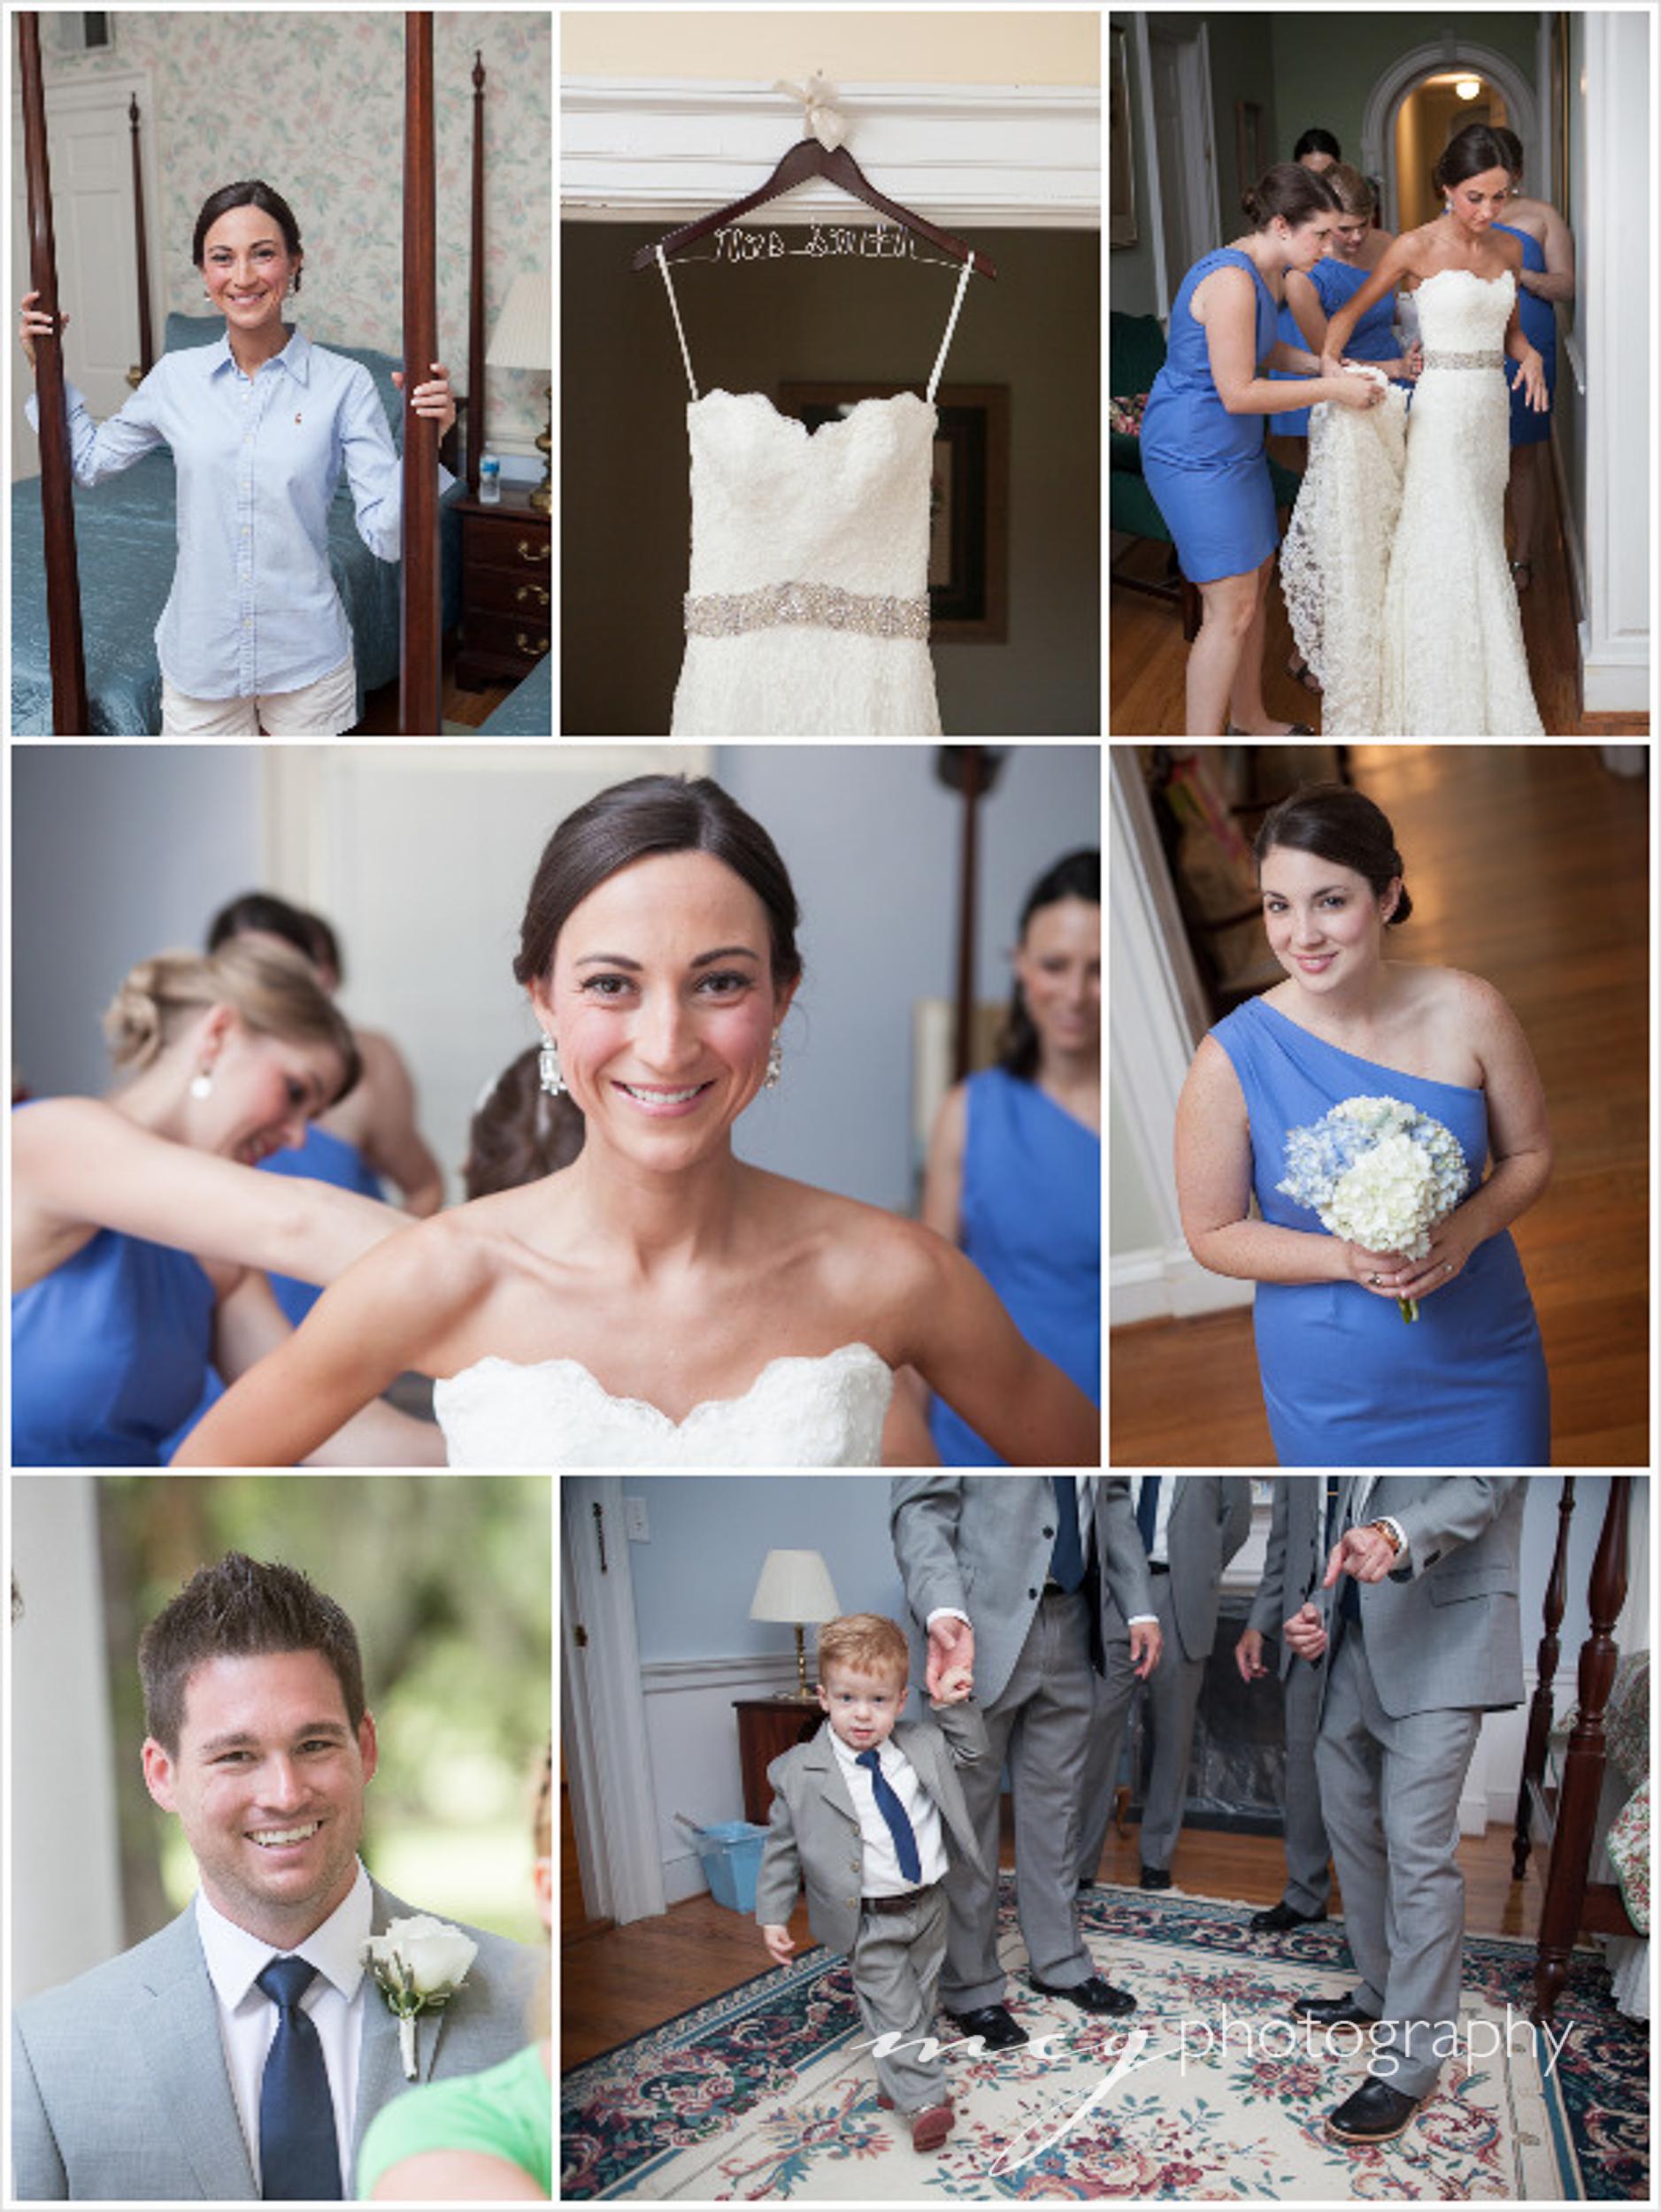 Bonnie Doone Wedding Photography